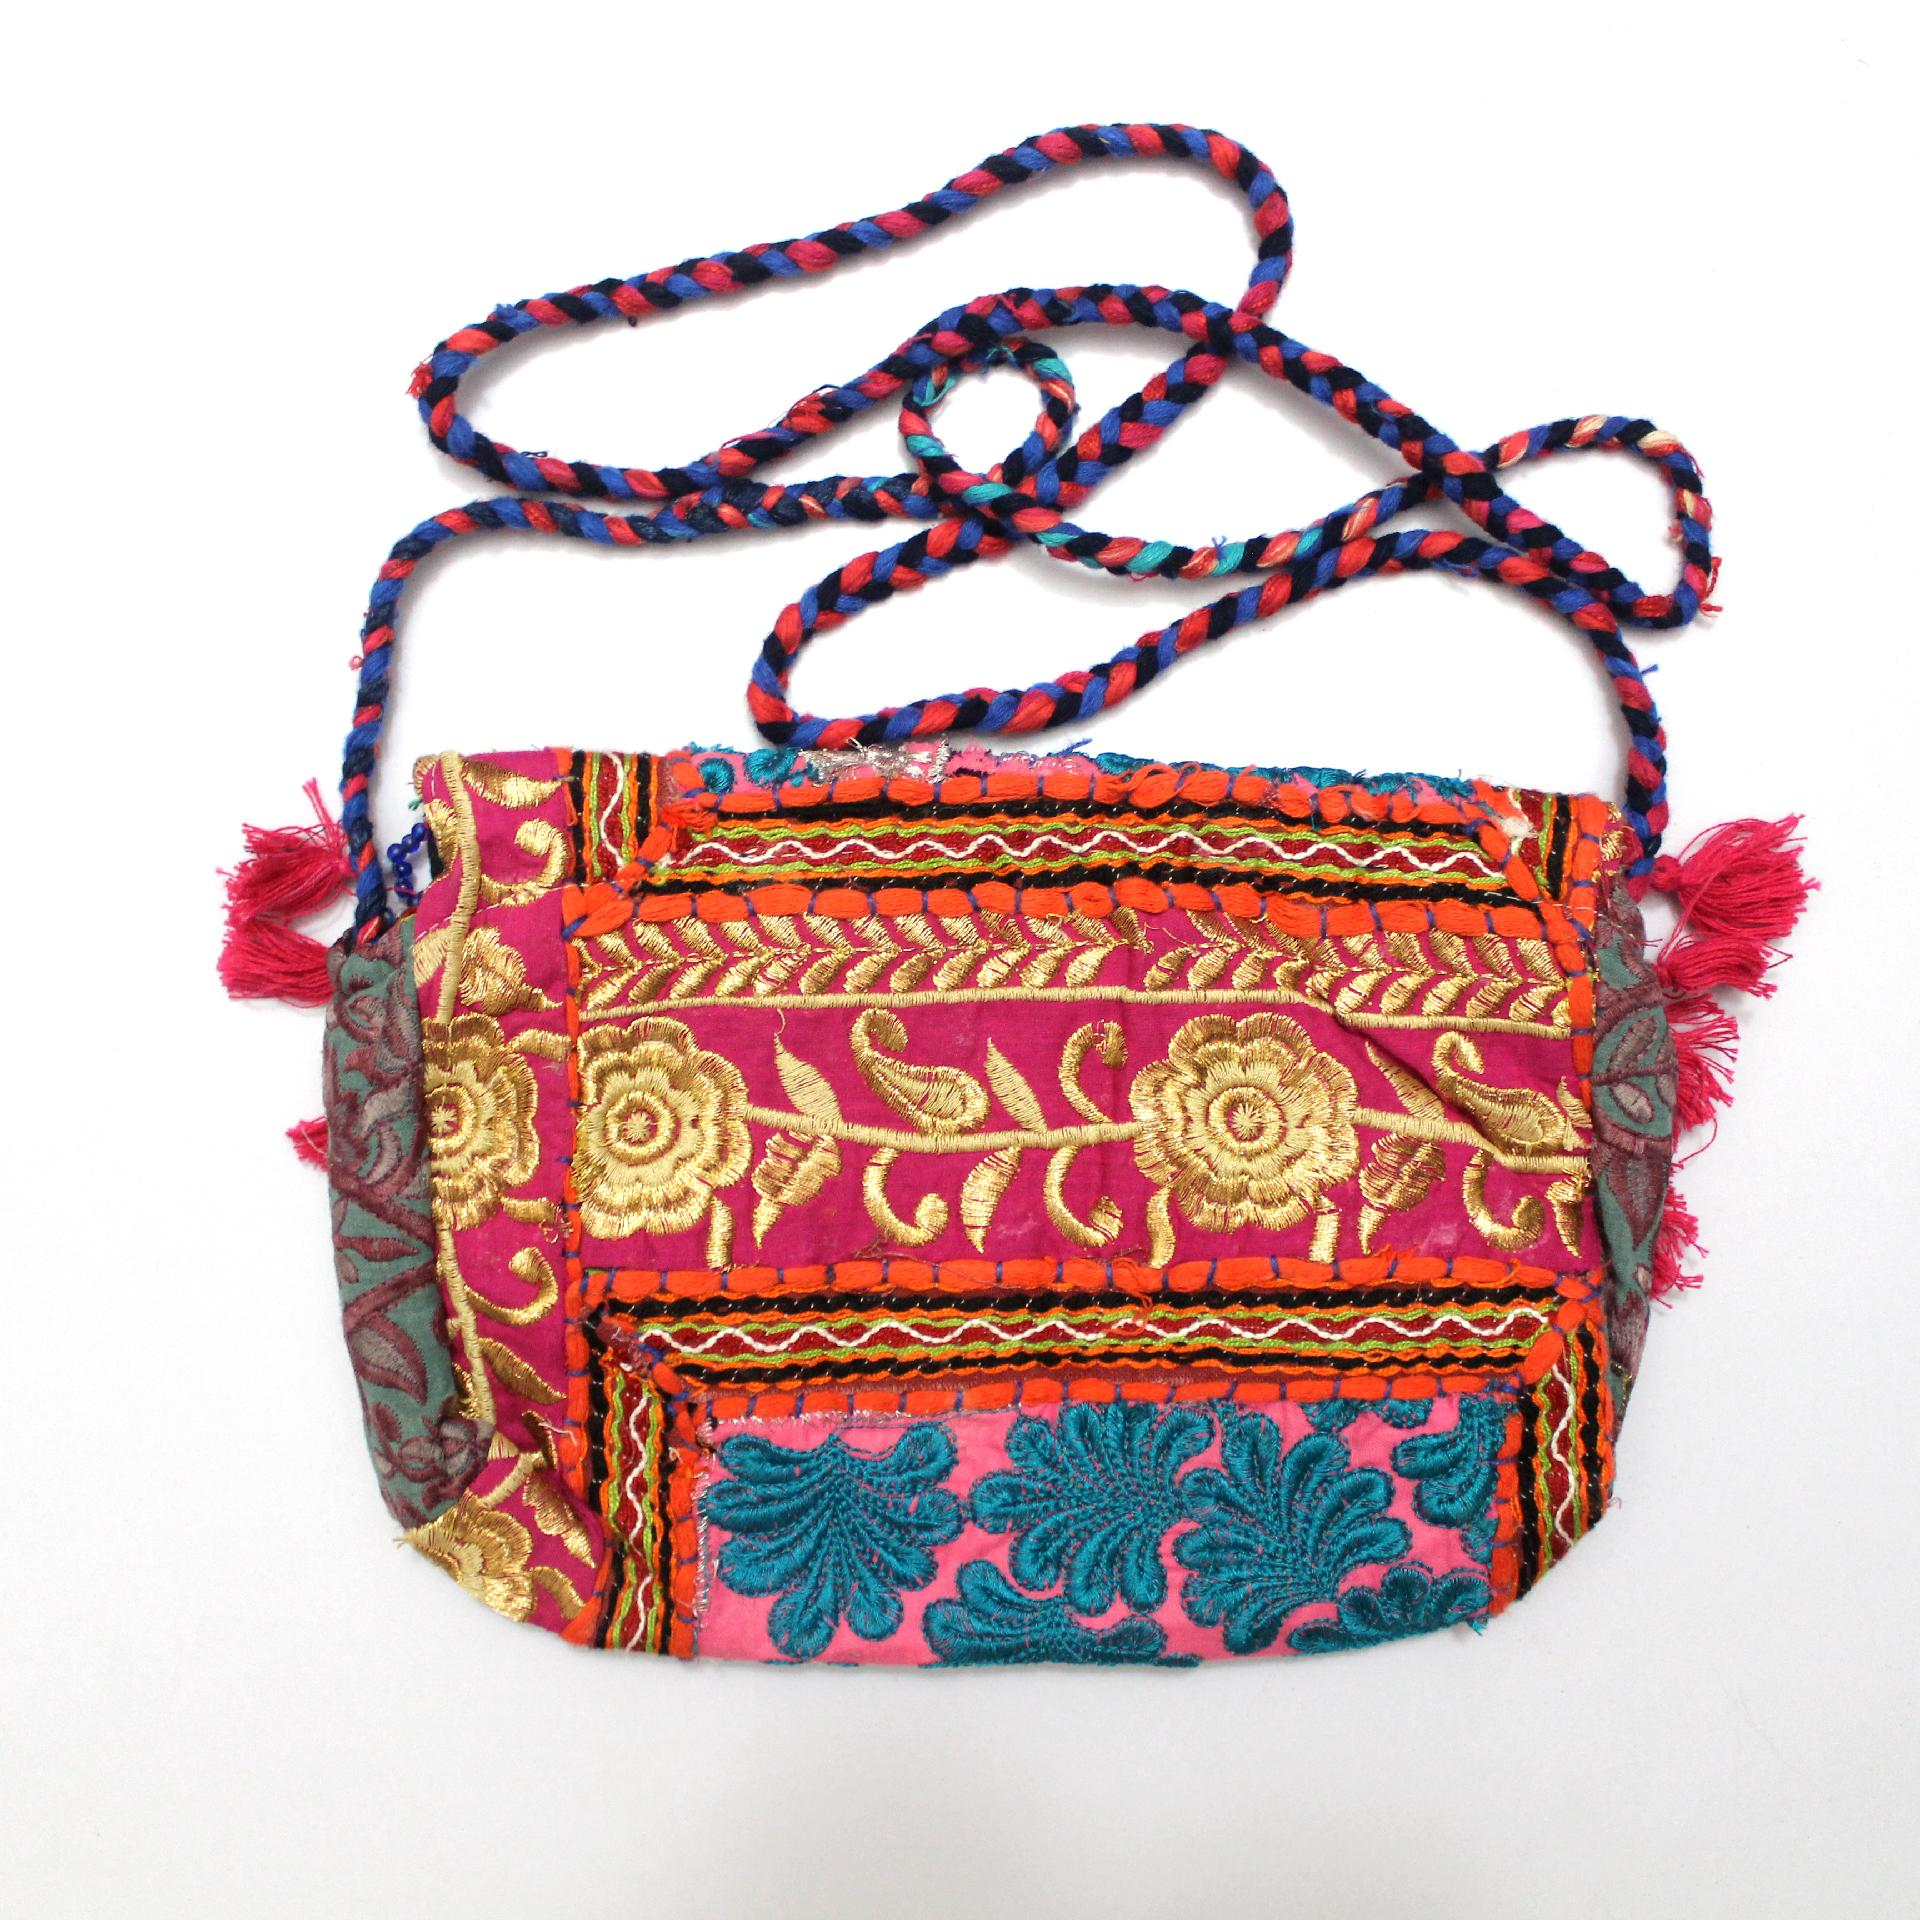 556ab8ca07 Vintage Tribal Banjara Indian Handmade Ethnic Women Purse Multicolor ...